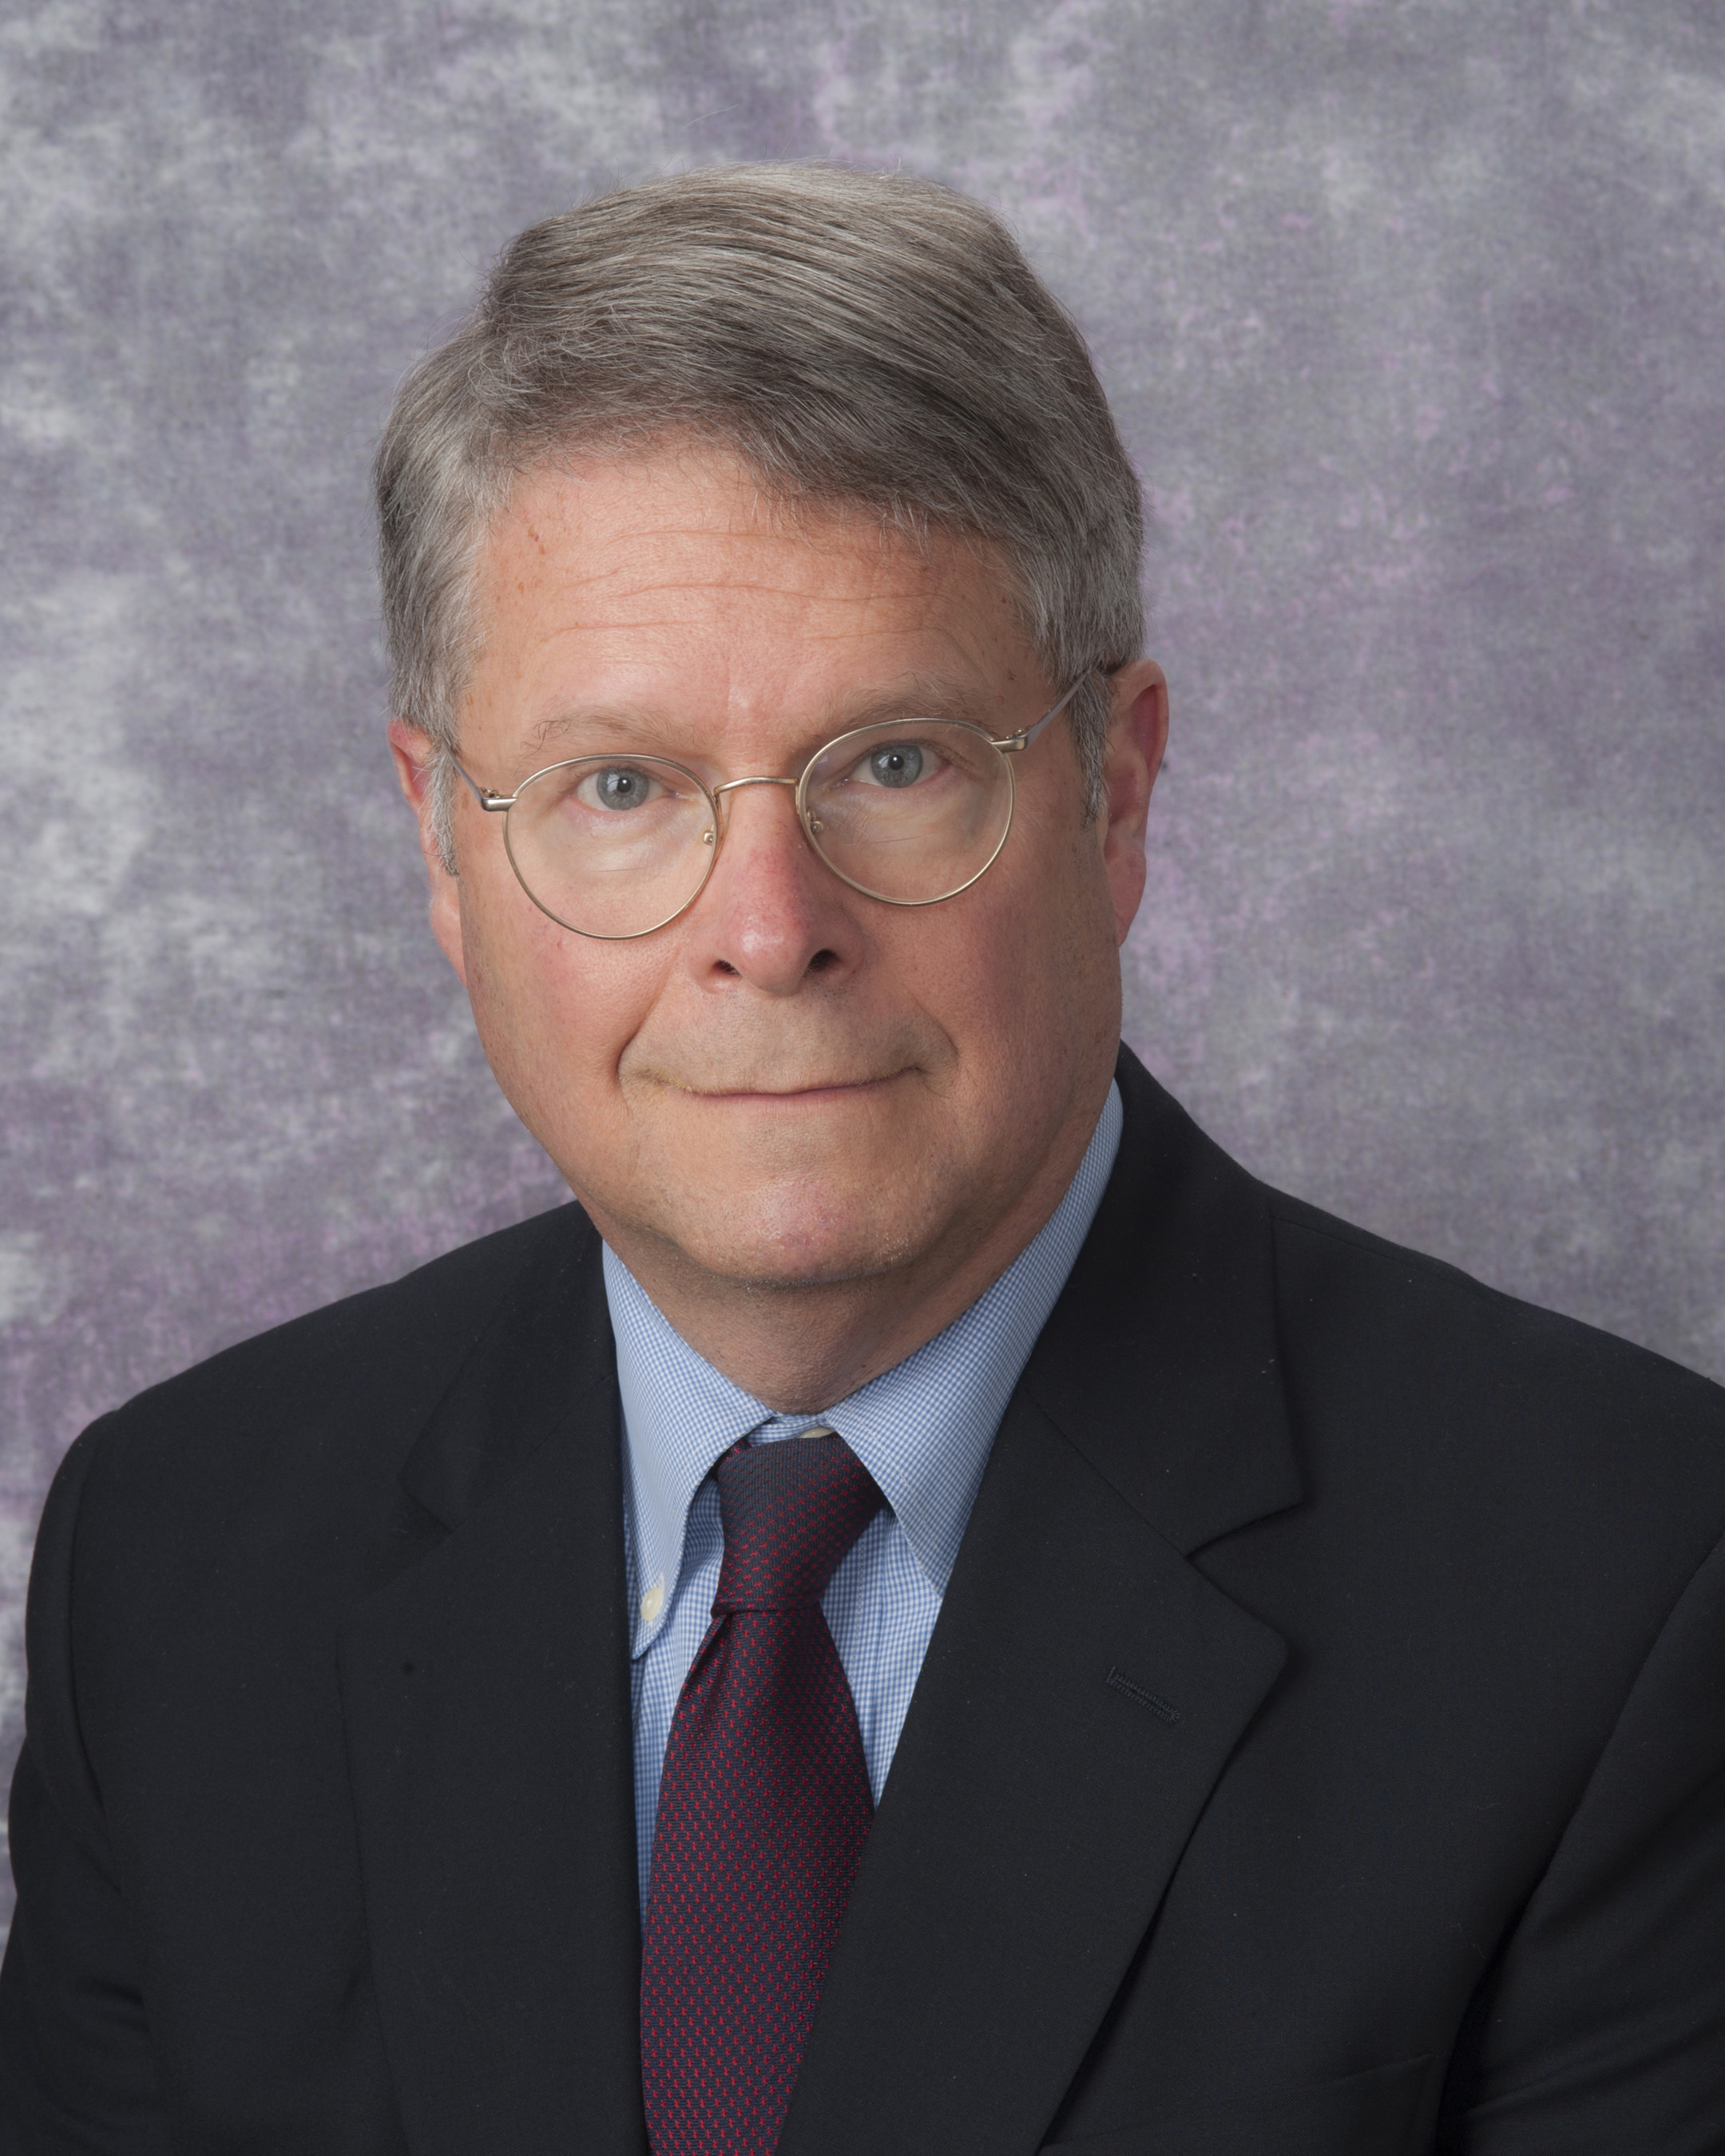 2016 Pardes Prize Recipient Charles F. Reynolds, III, M.D.